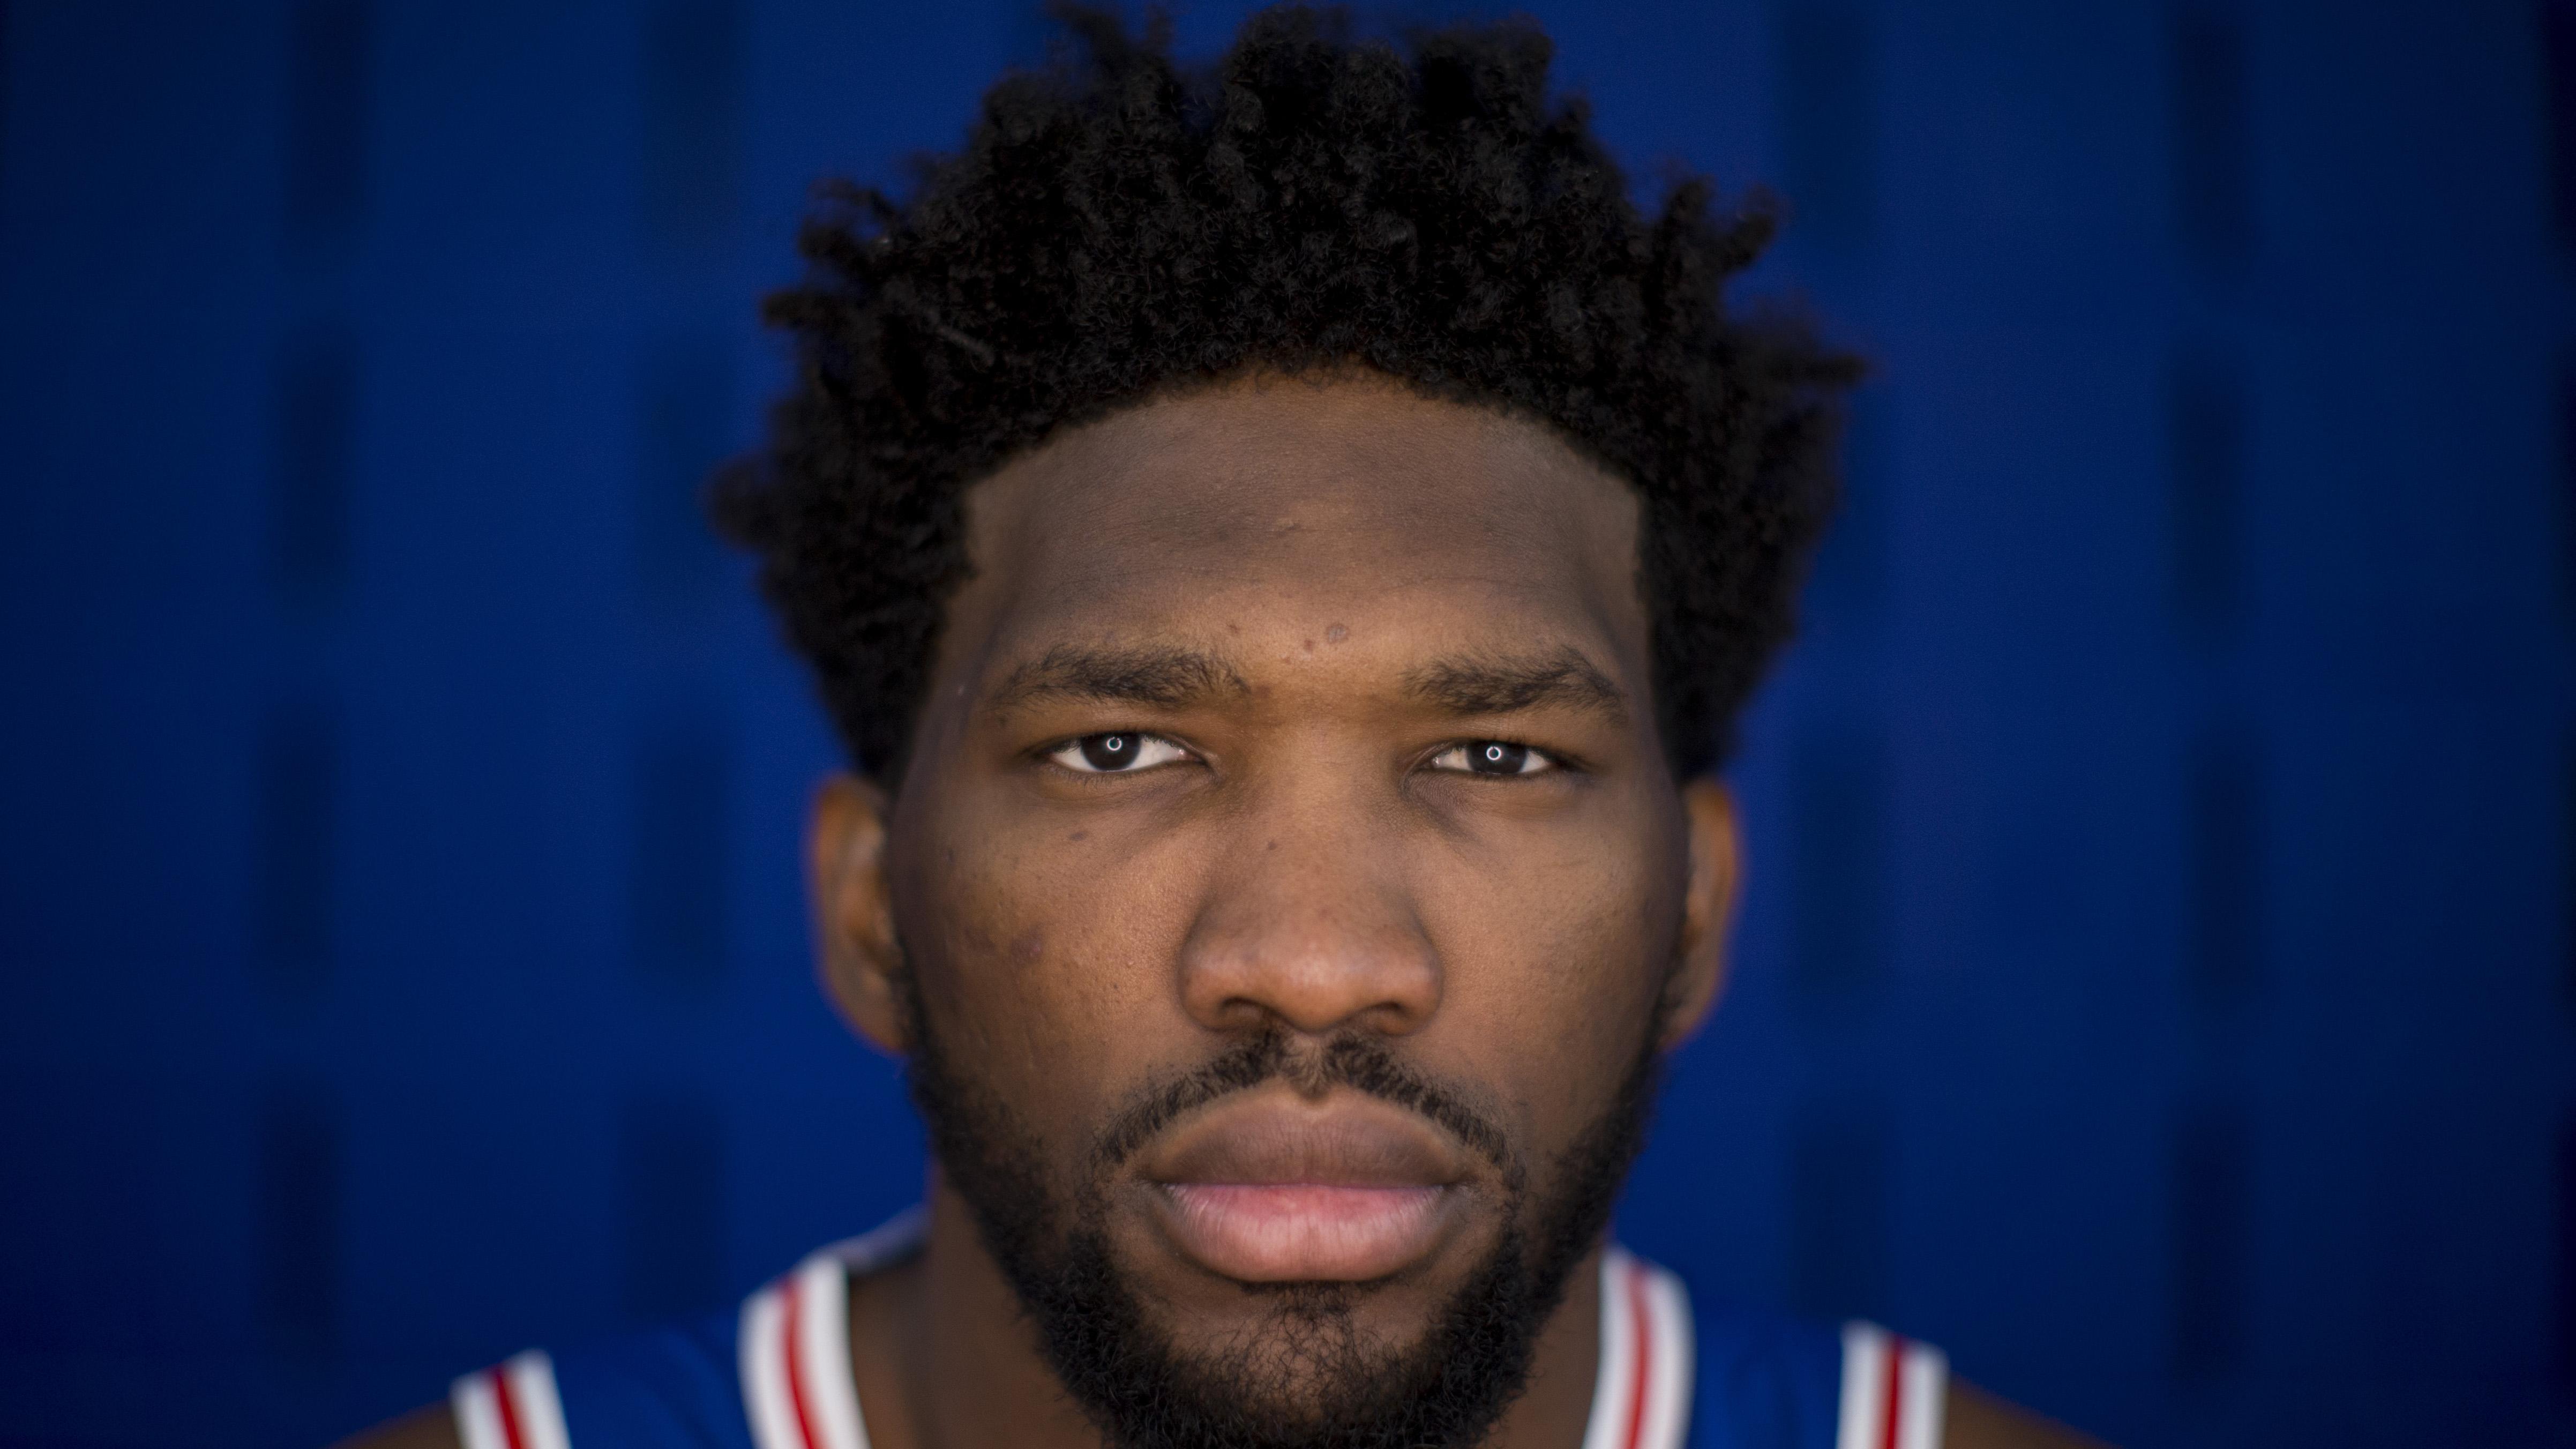 Joel Embiid NBA Philadelphia 76ers